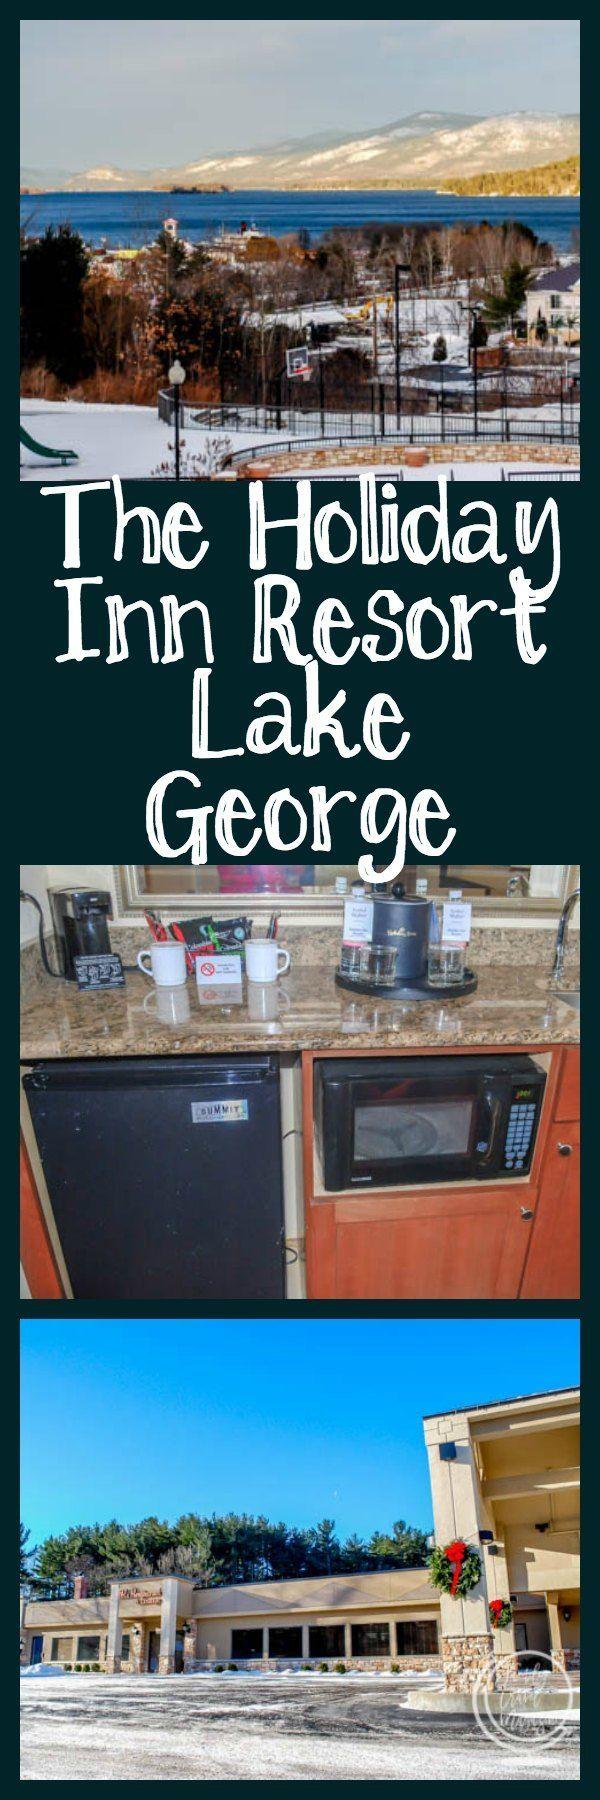 Kid-Friendly Suite Hotel in Lake George, NY: The Holiday Inn Resort Lake George